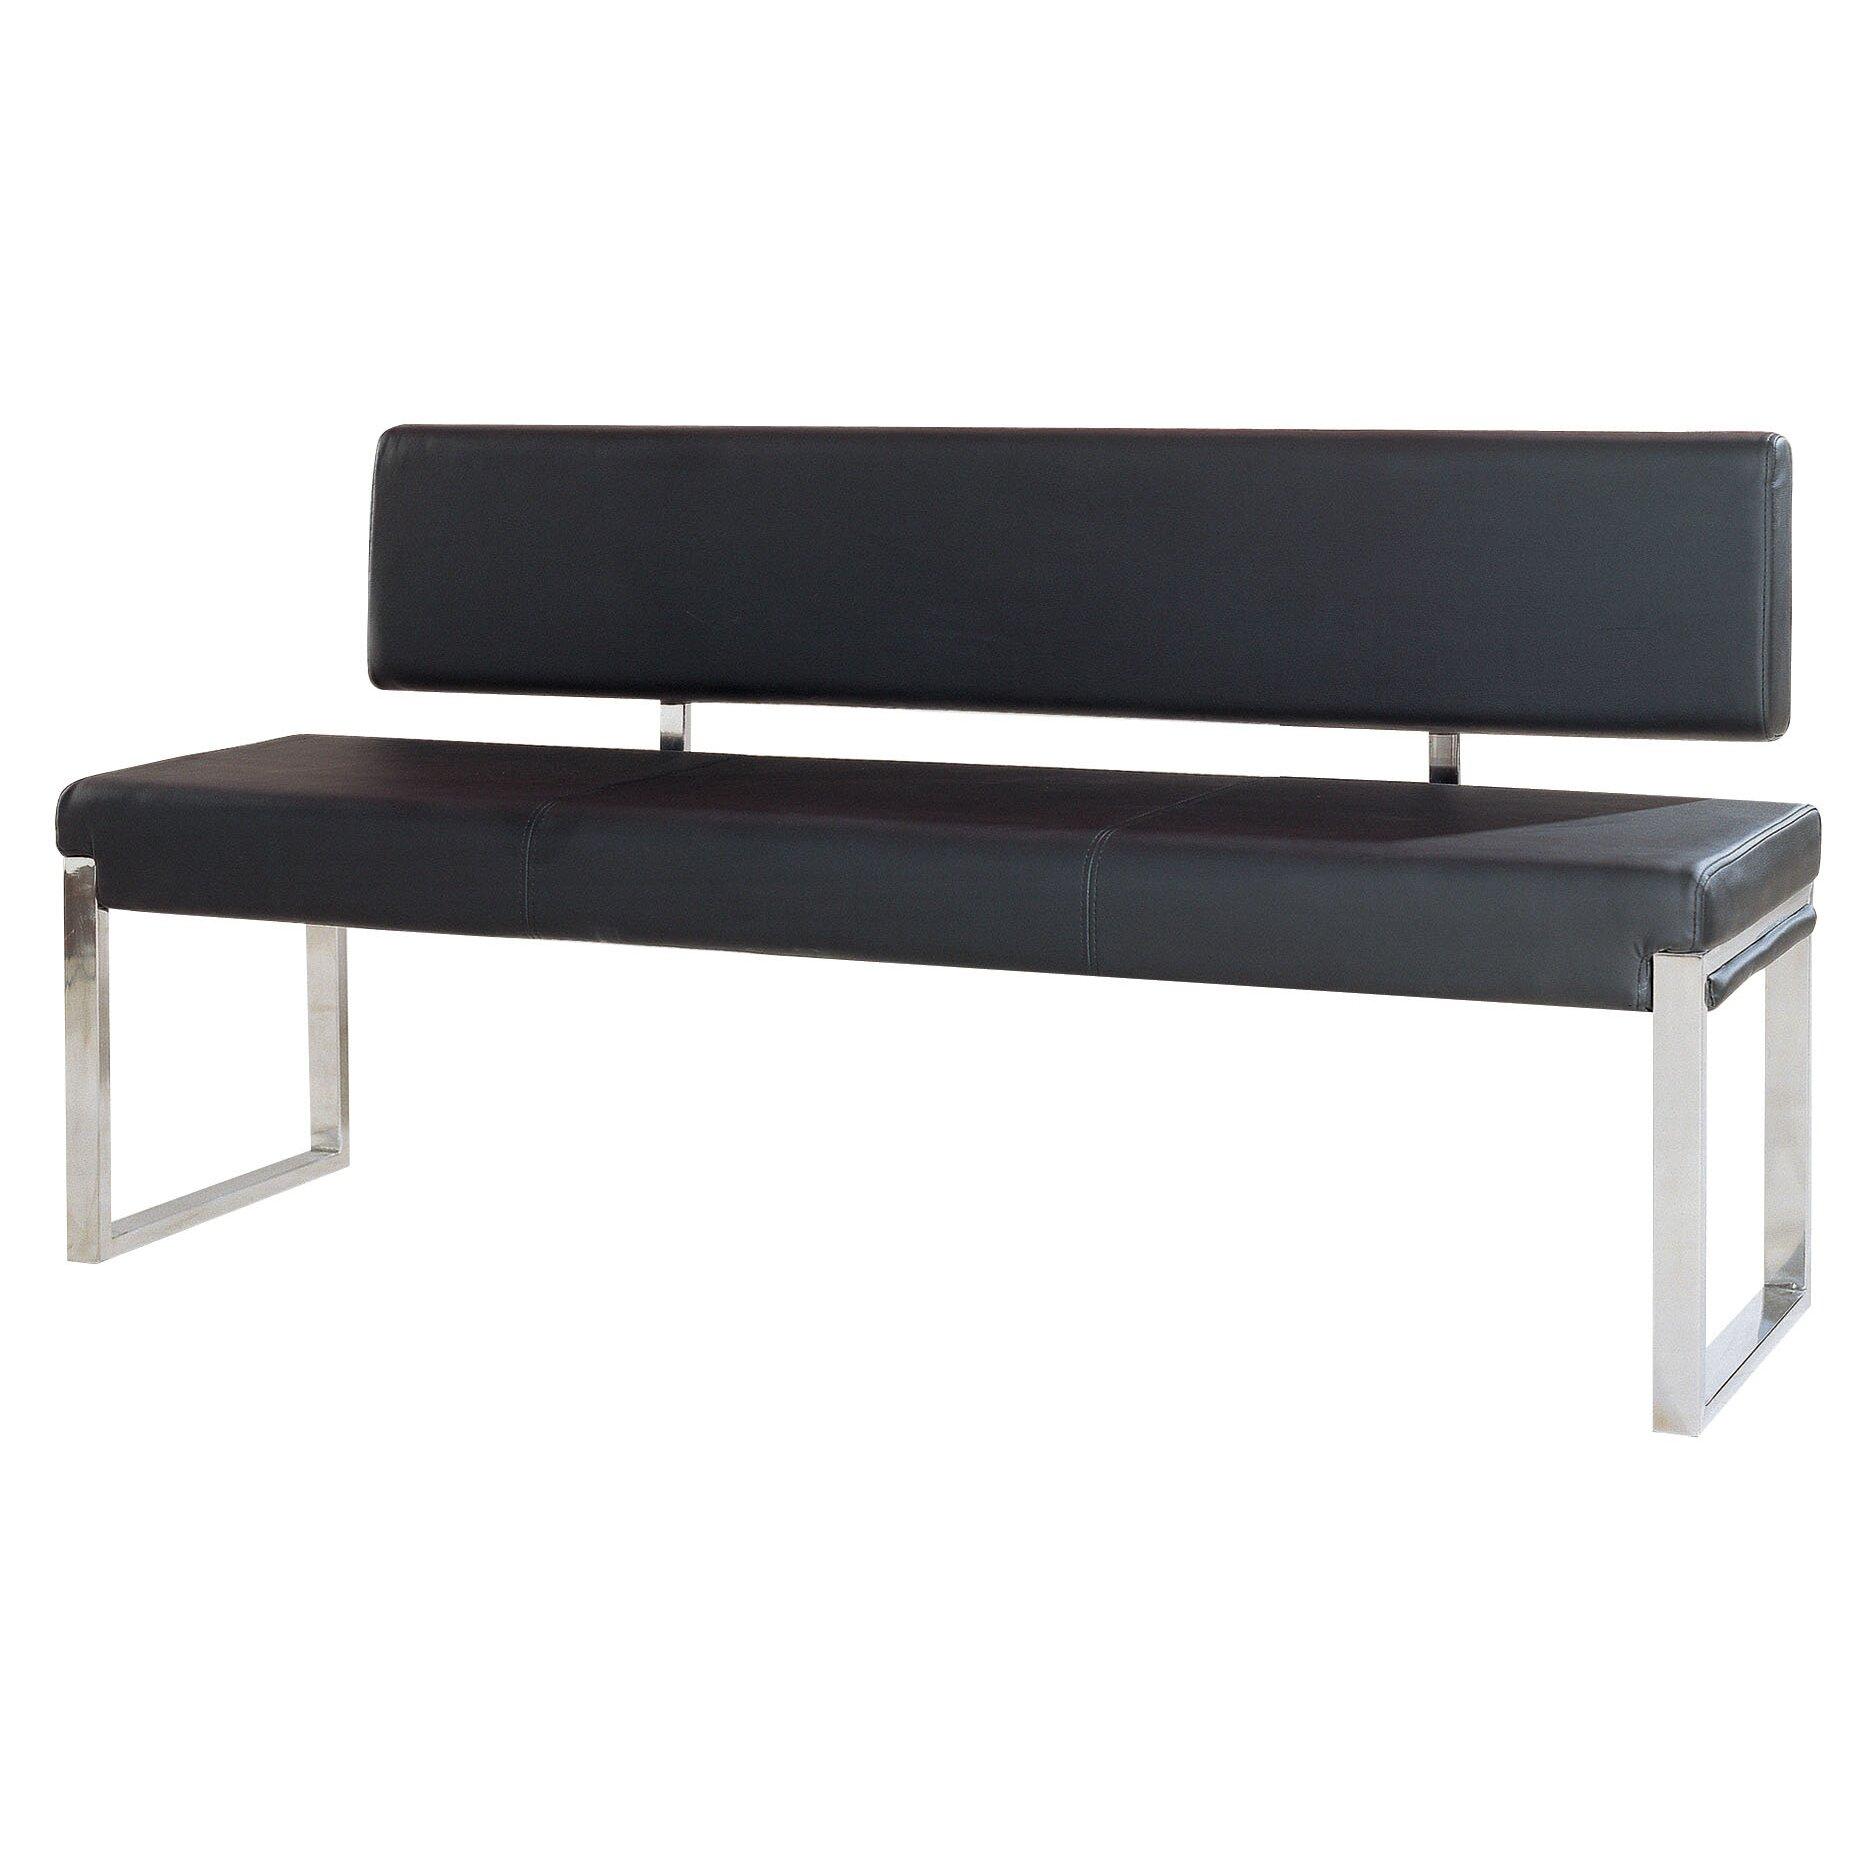 diamond sofa knox upholstered bedroom bench & reviews   wayfair